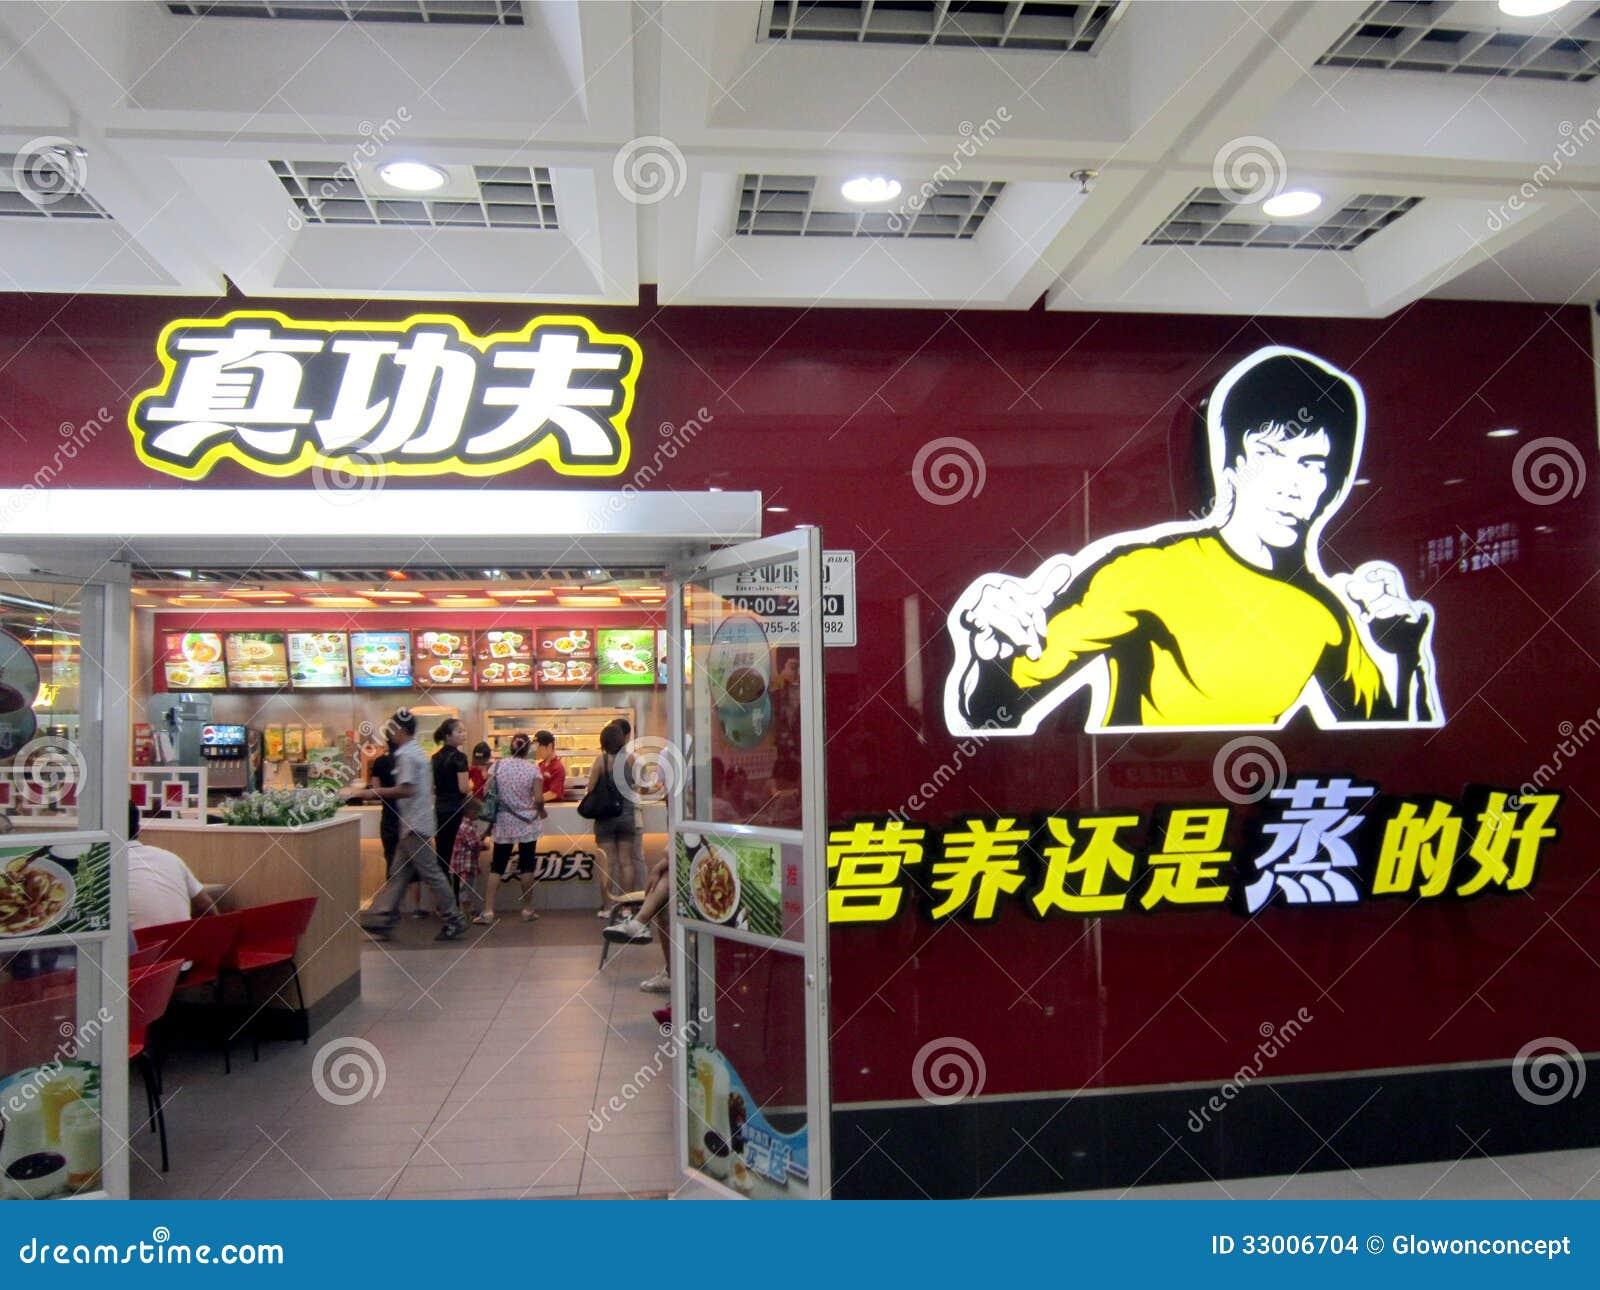 Chinese Restaurant Nutrition